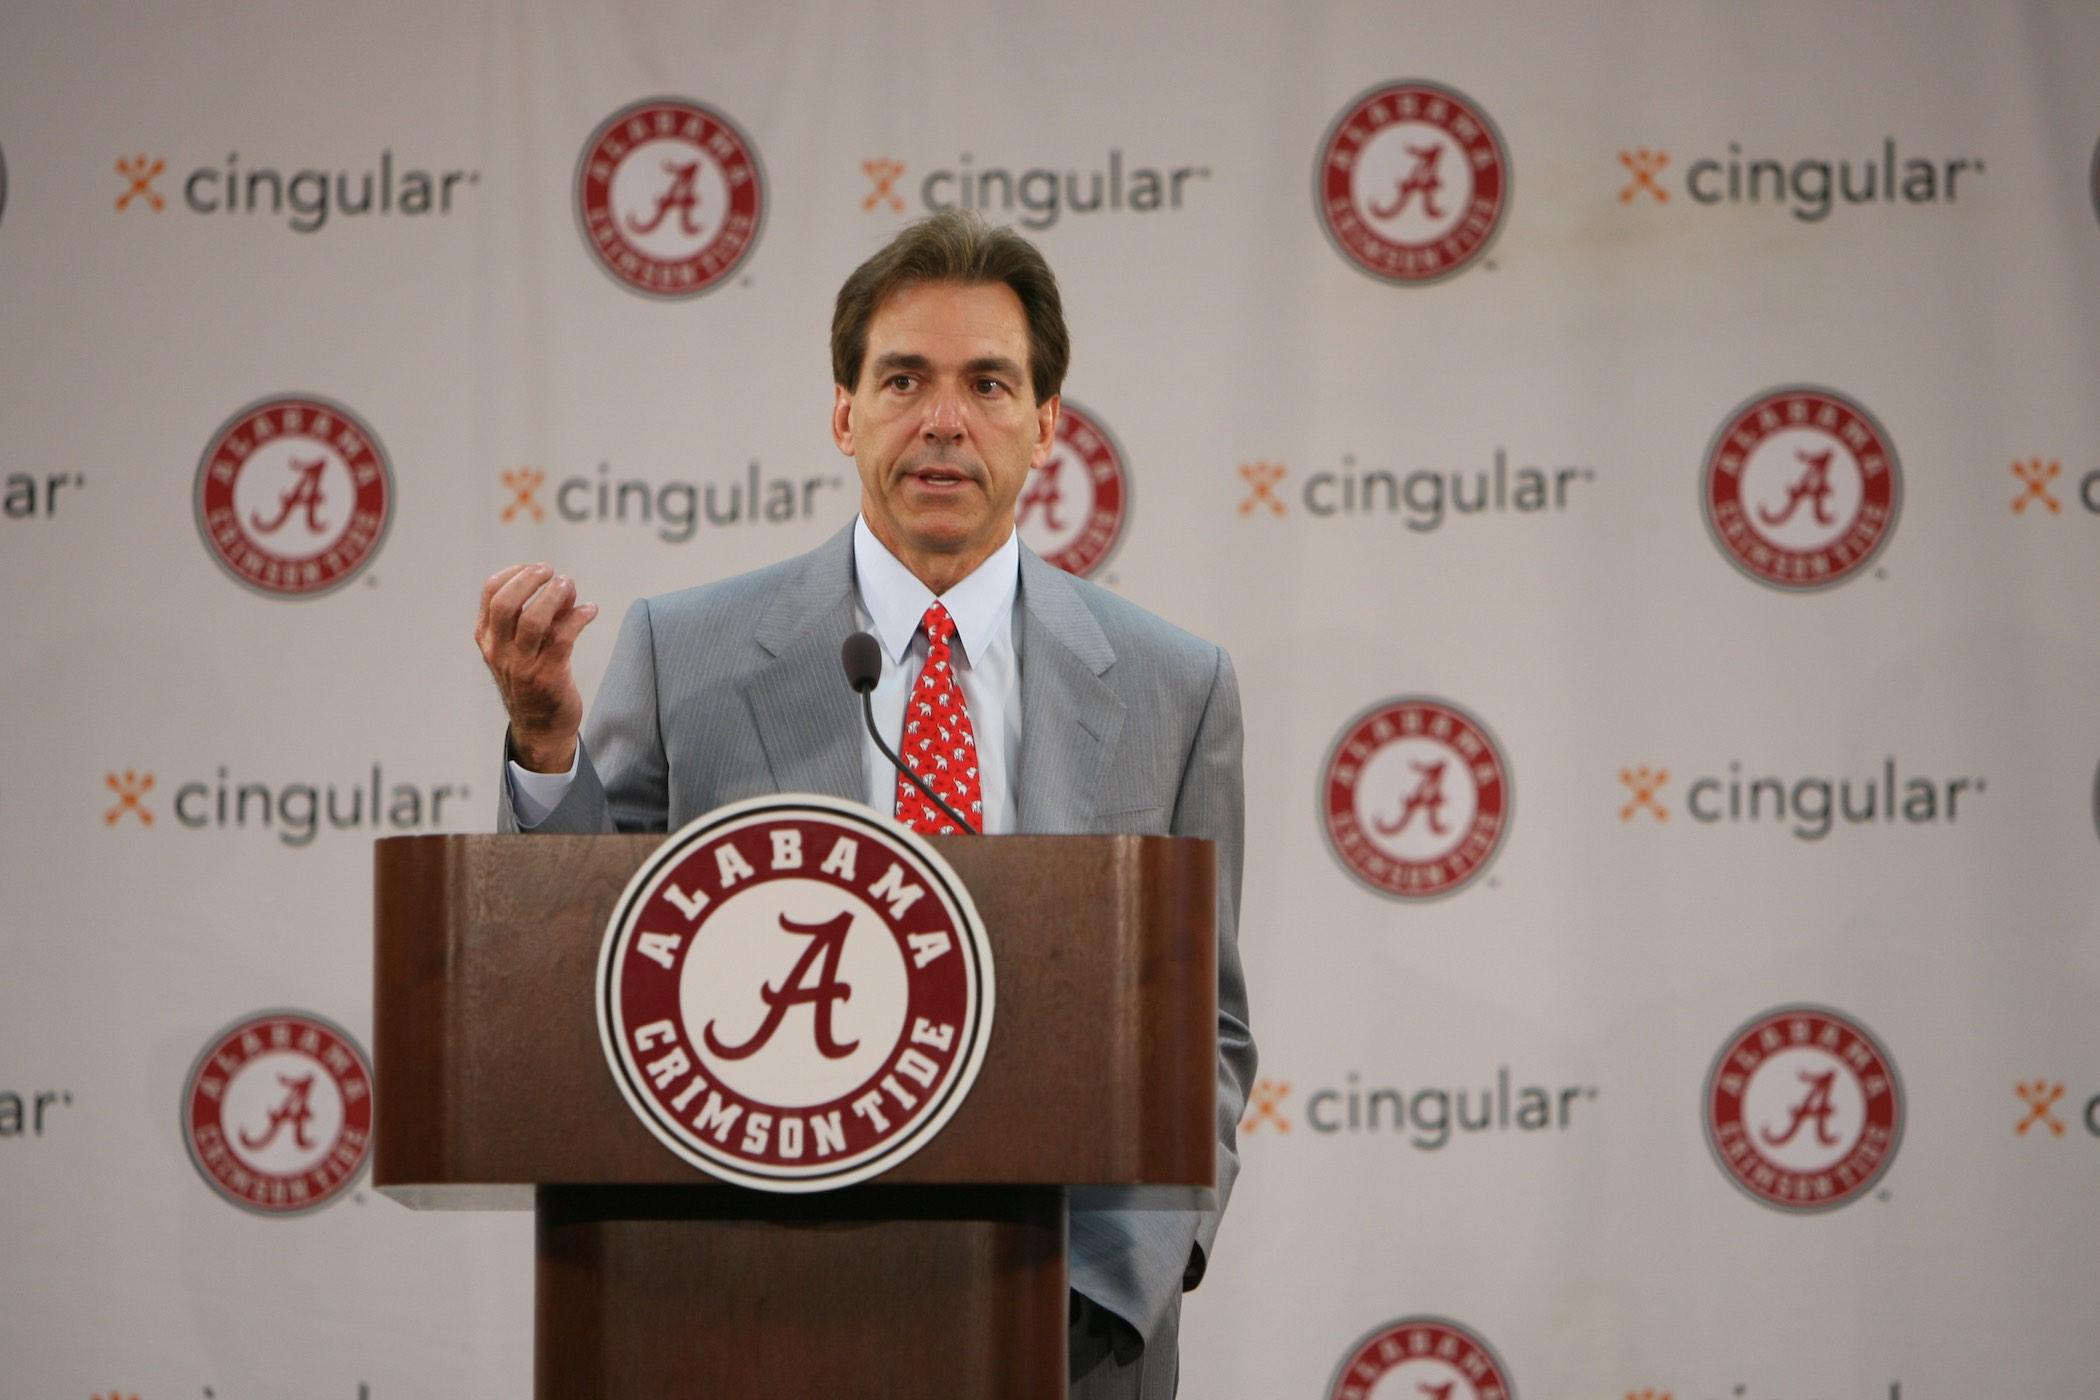 How was Nick Saban hired at Alabama